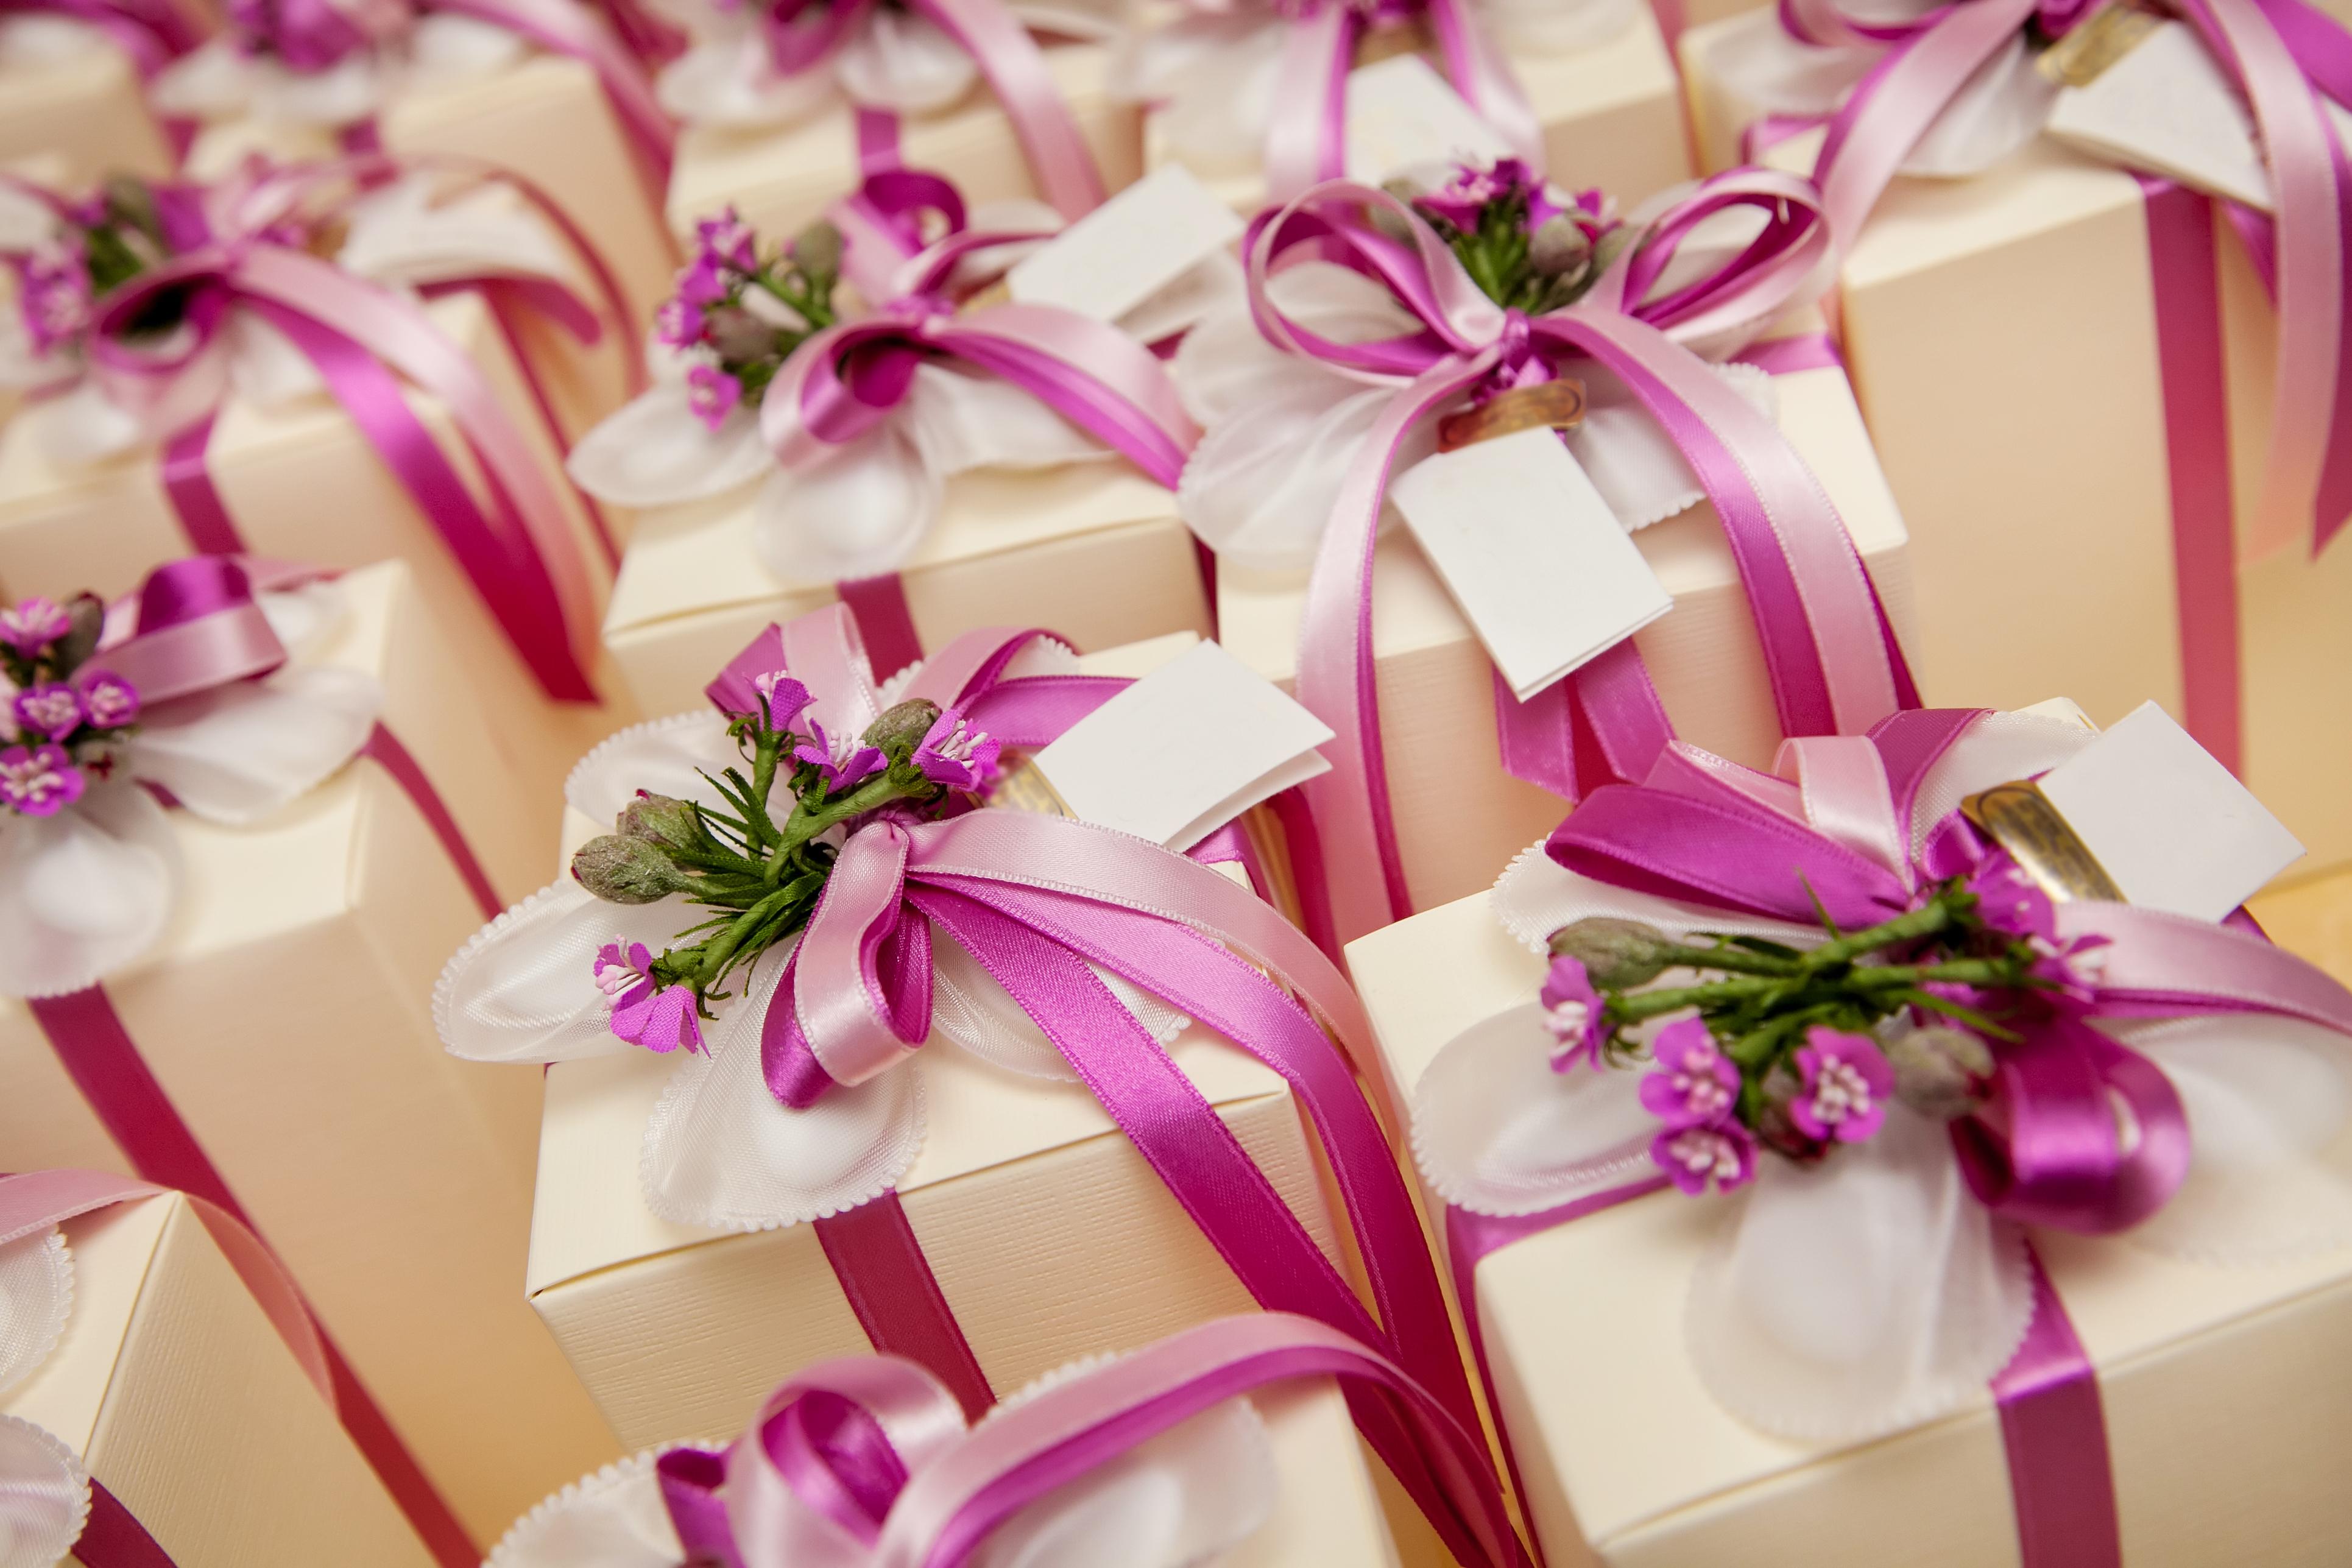 Подарки к свадьбе своими руками идеи фото